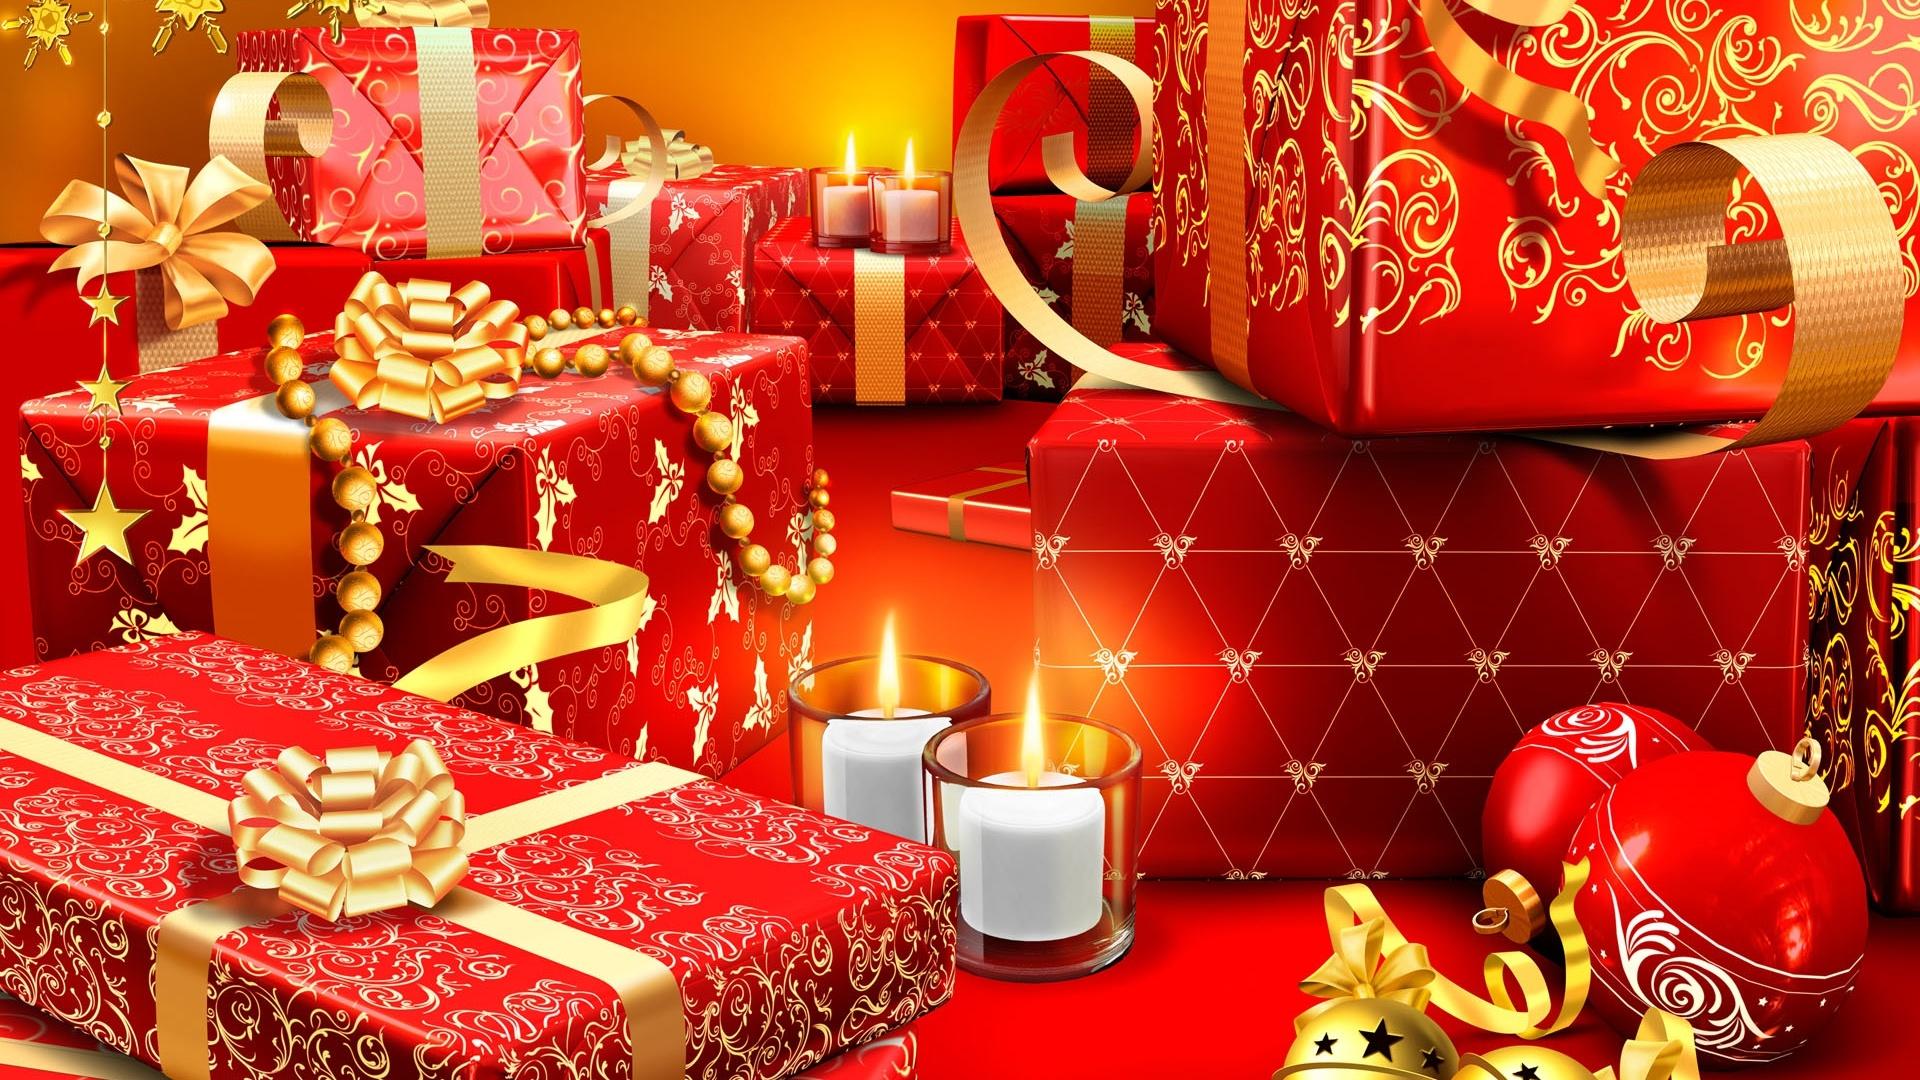 1920x1080 Christmas presents desktop PC and Mac wallpaper 1920x1080